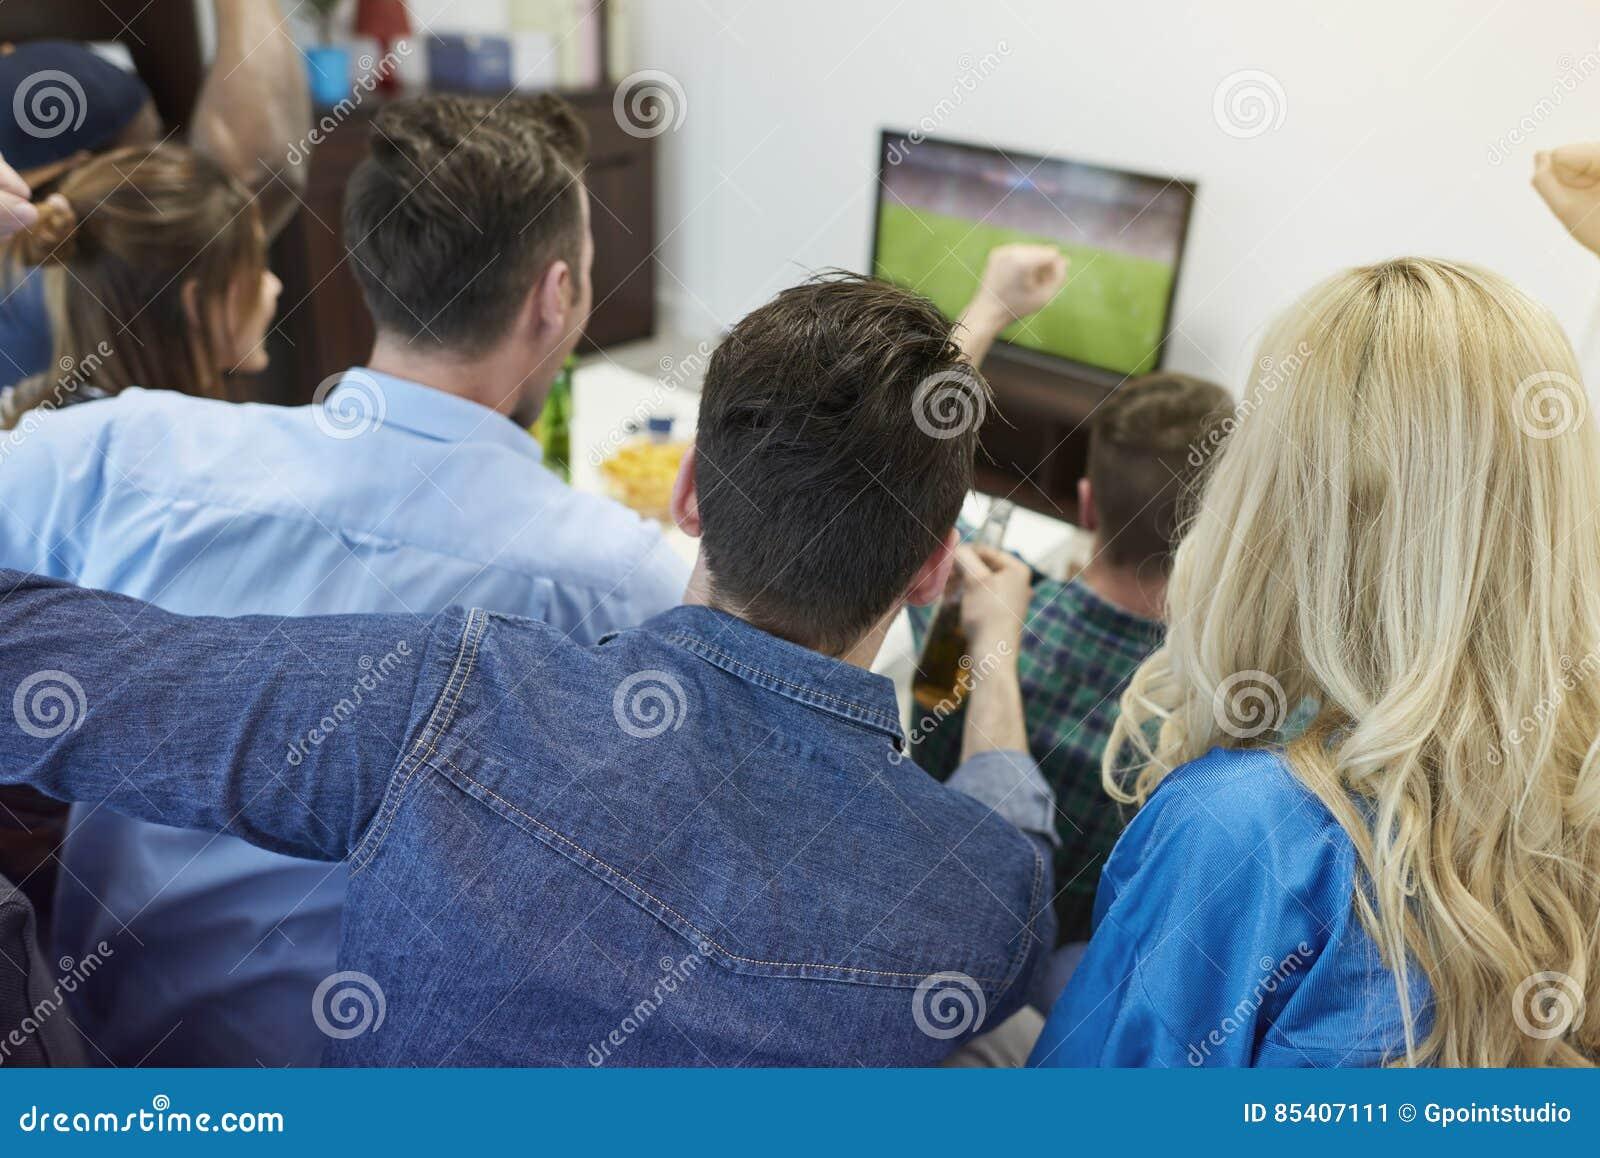 Fotbollsfan